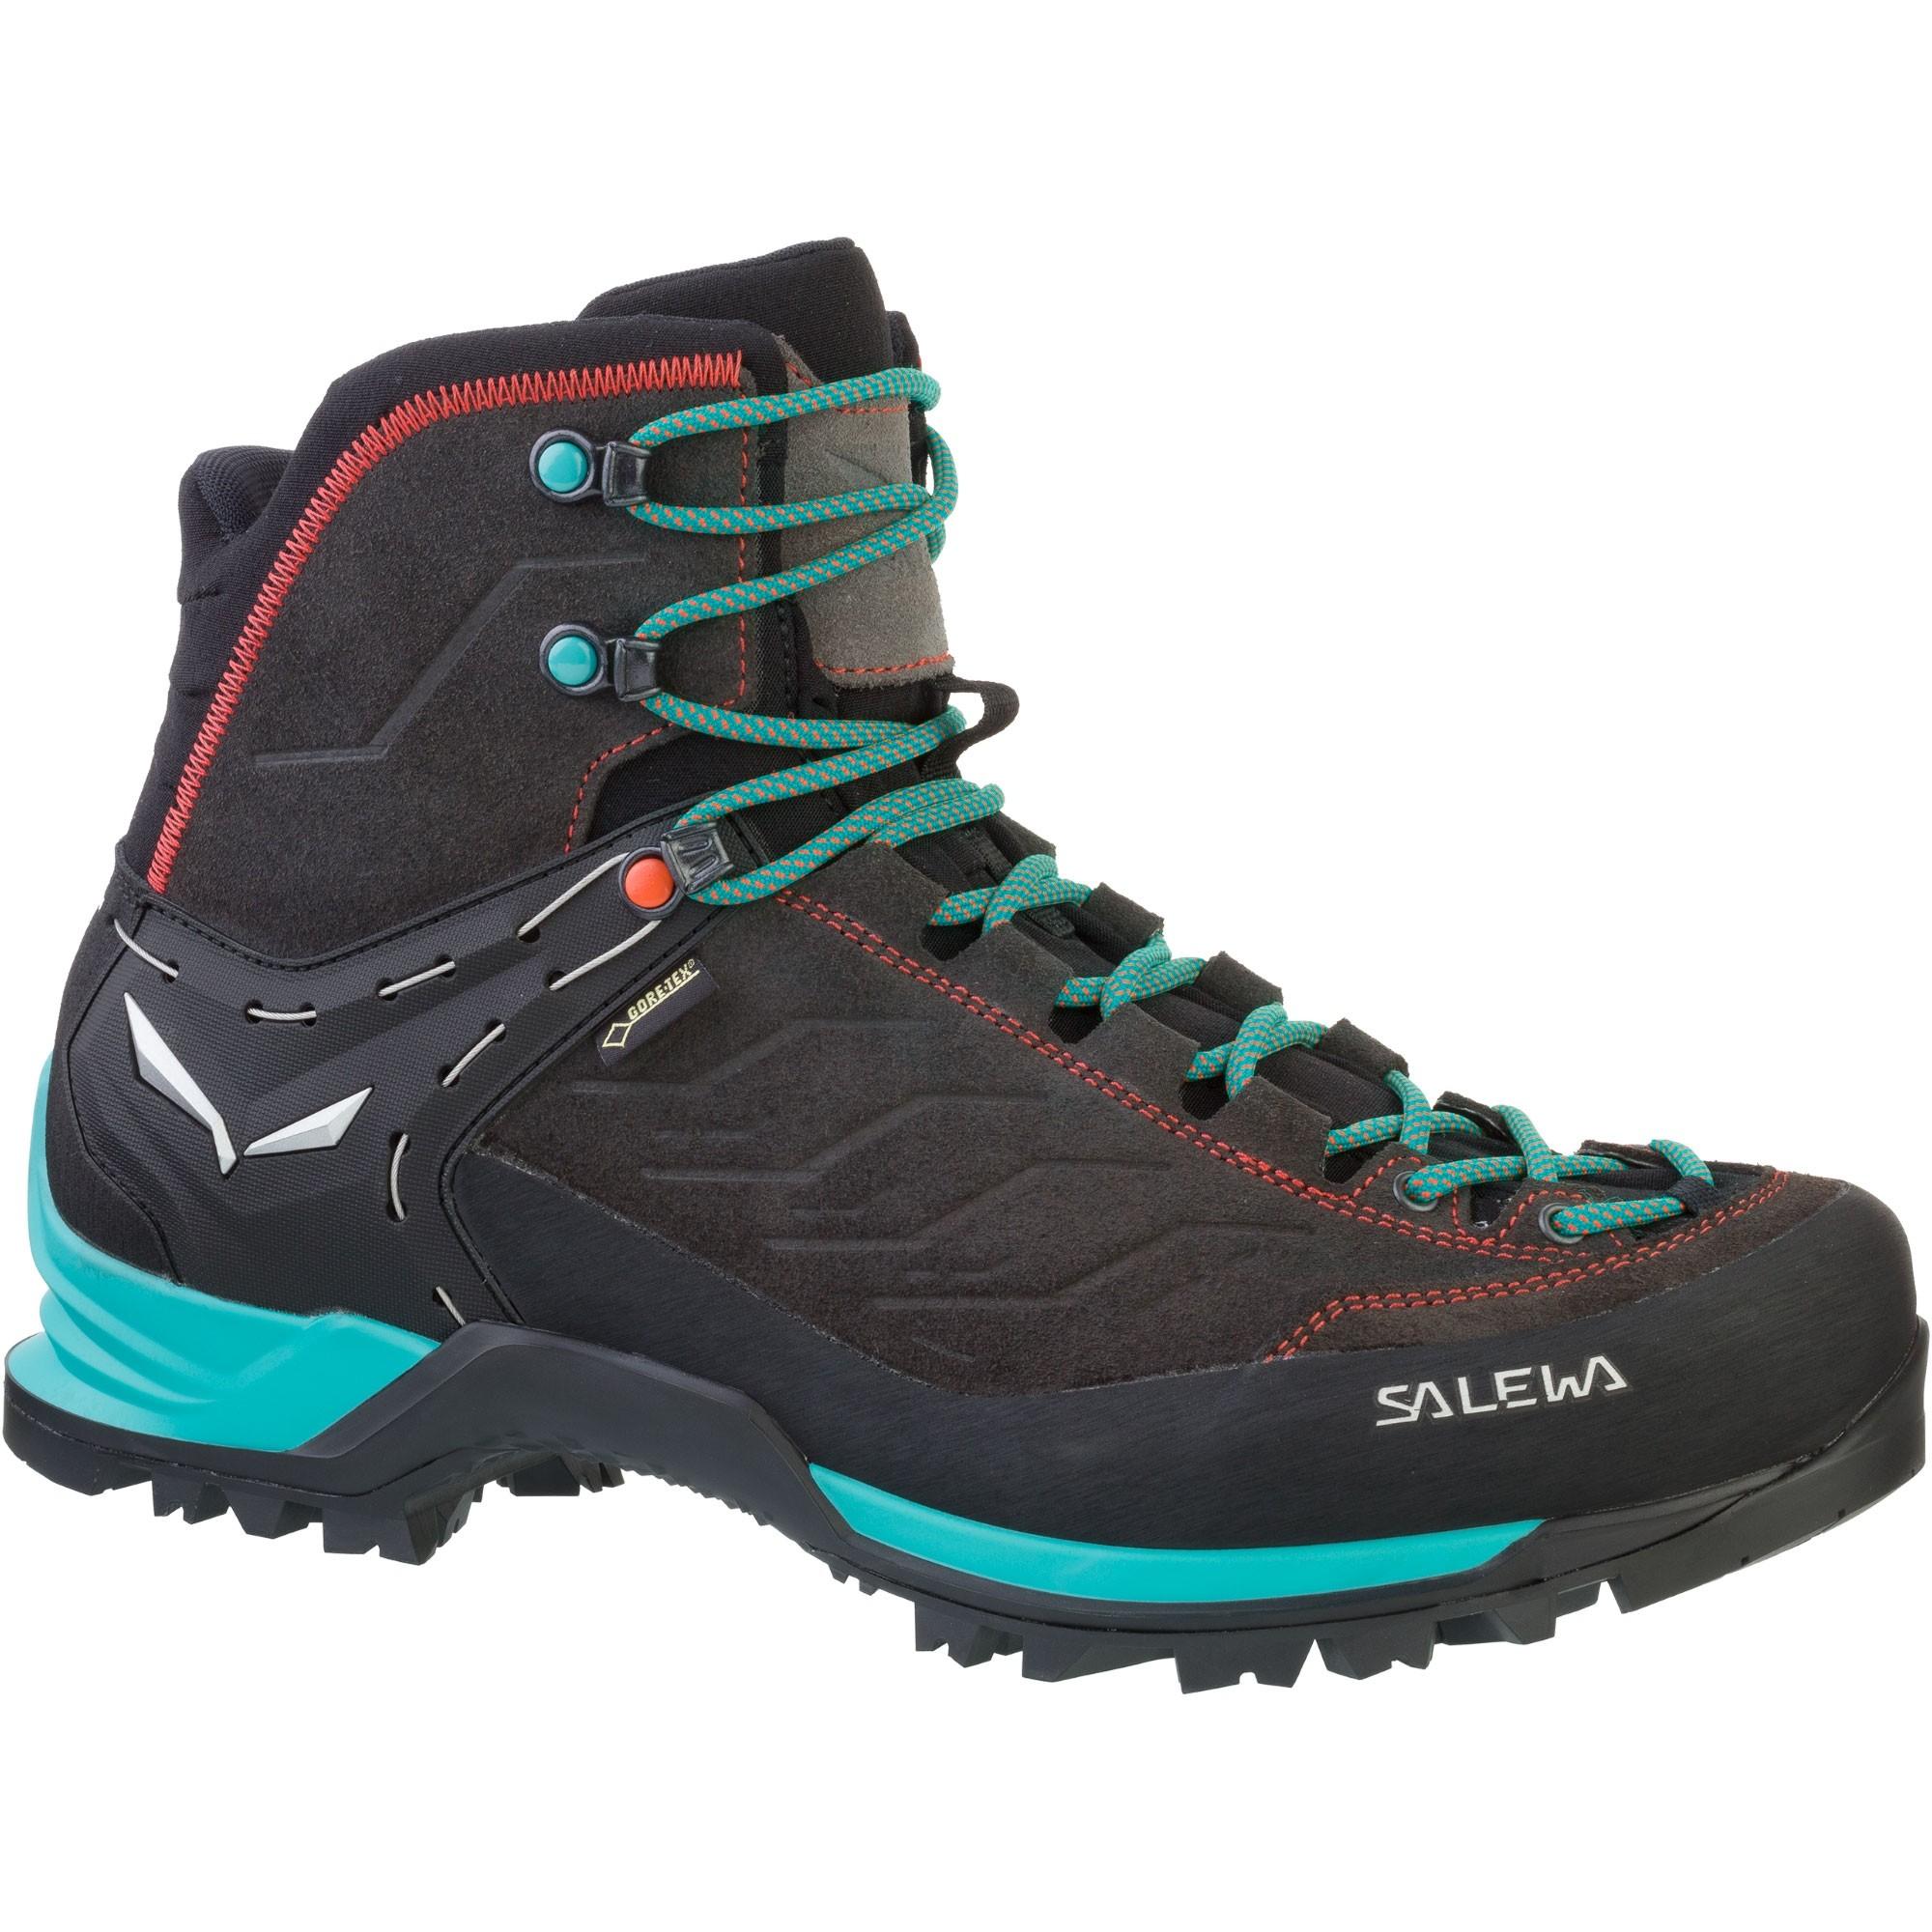 Salewa Mountain Trainer Mid GTX Women's Walking Boots